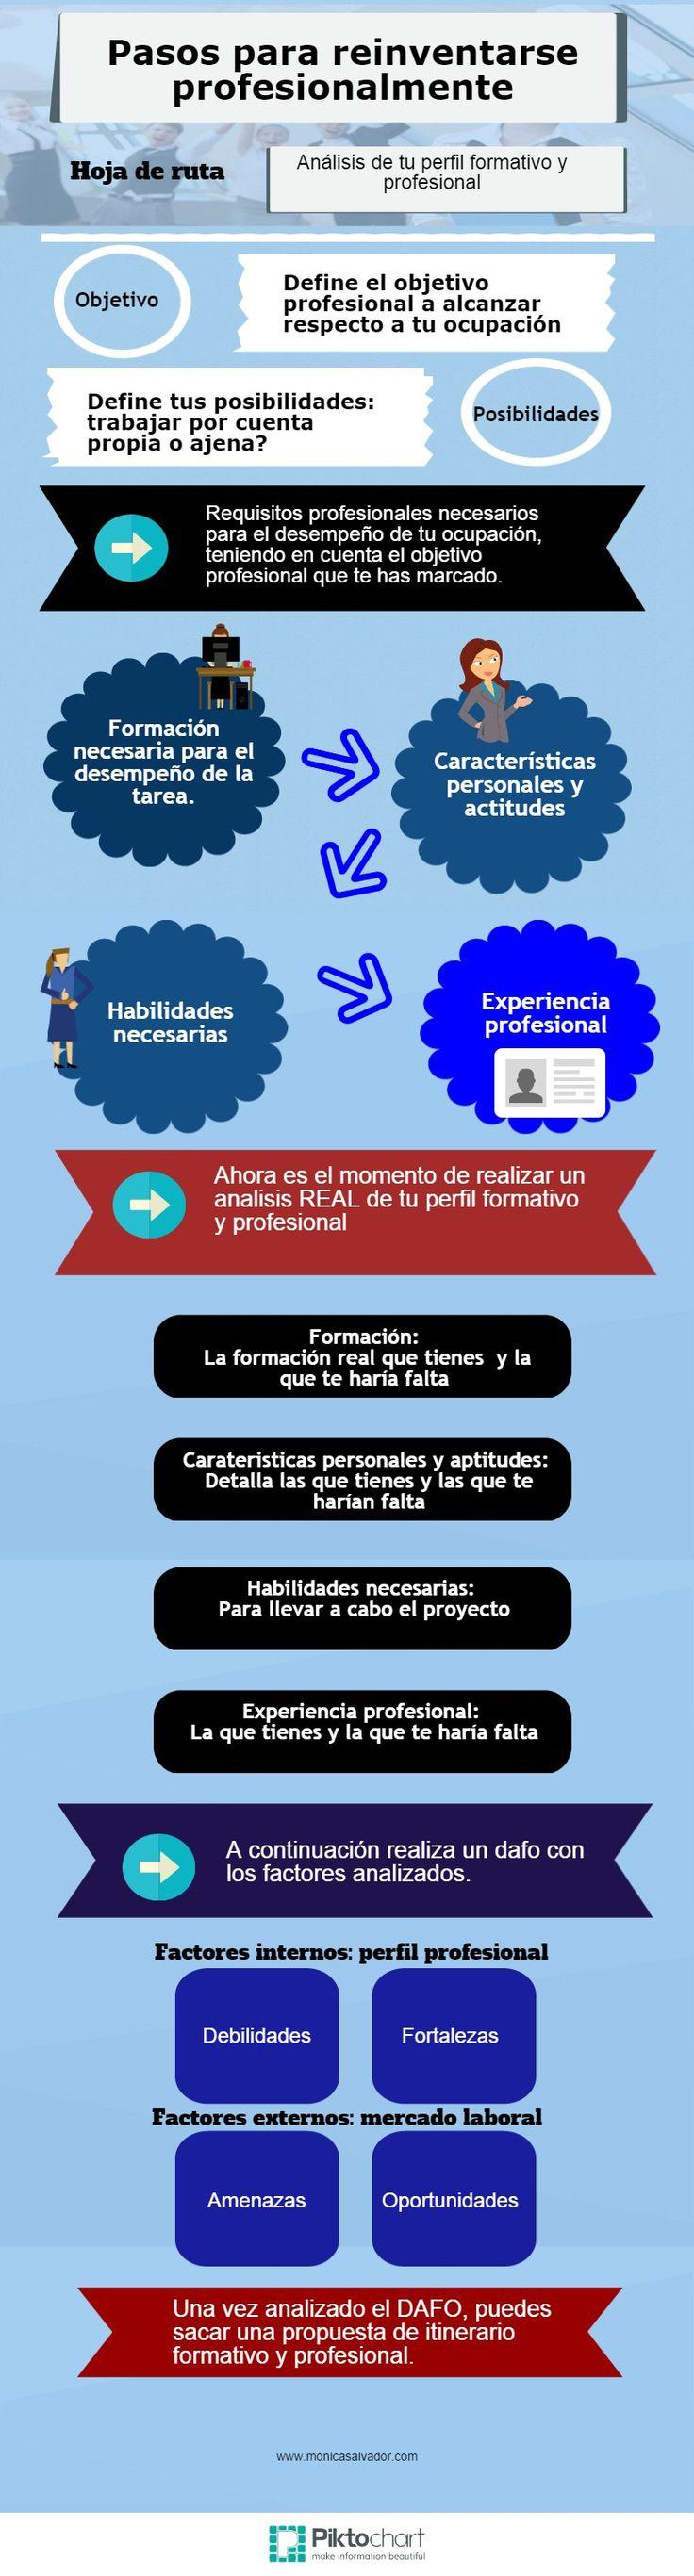 Pasos para reinventarse profesionalmente #empleo #rrhh #recursoshumanos #infografia